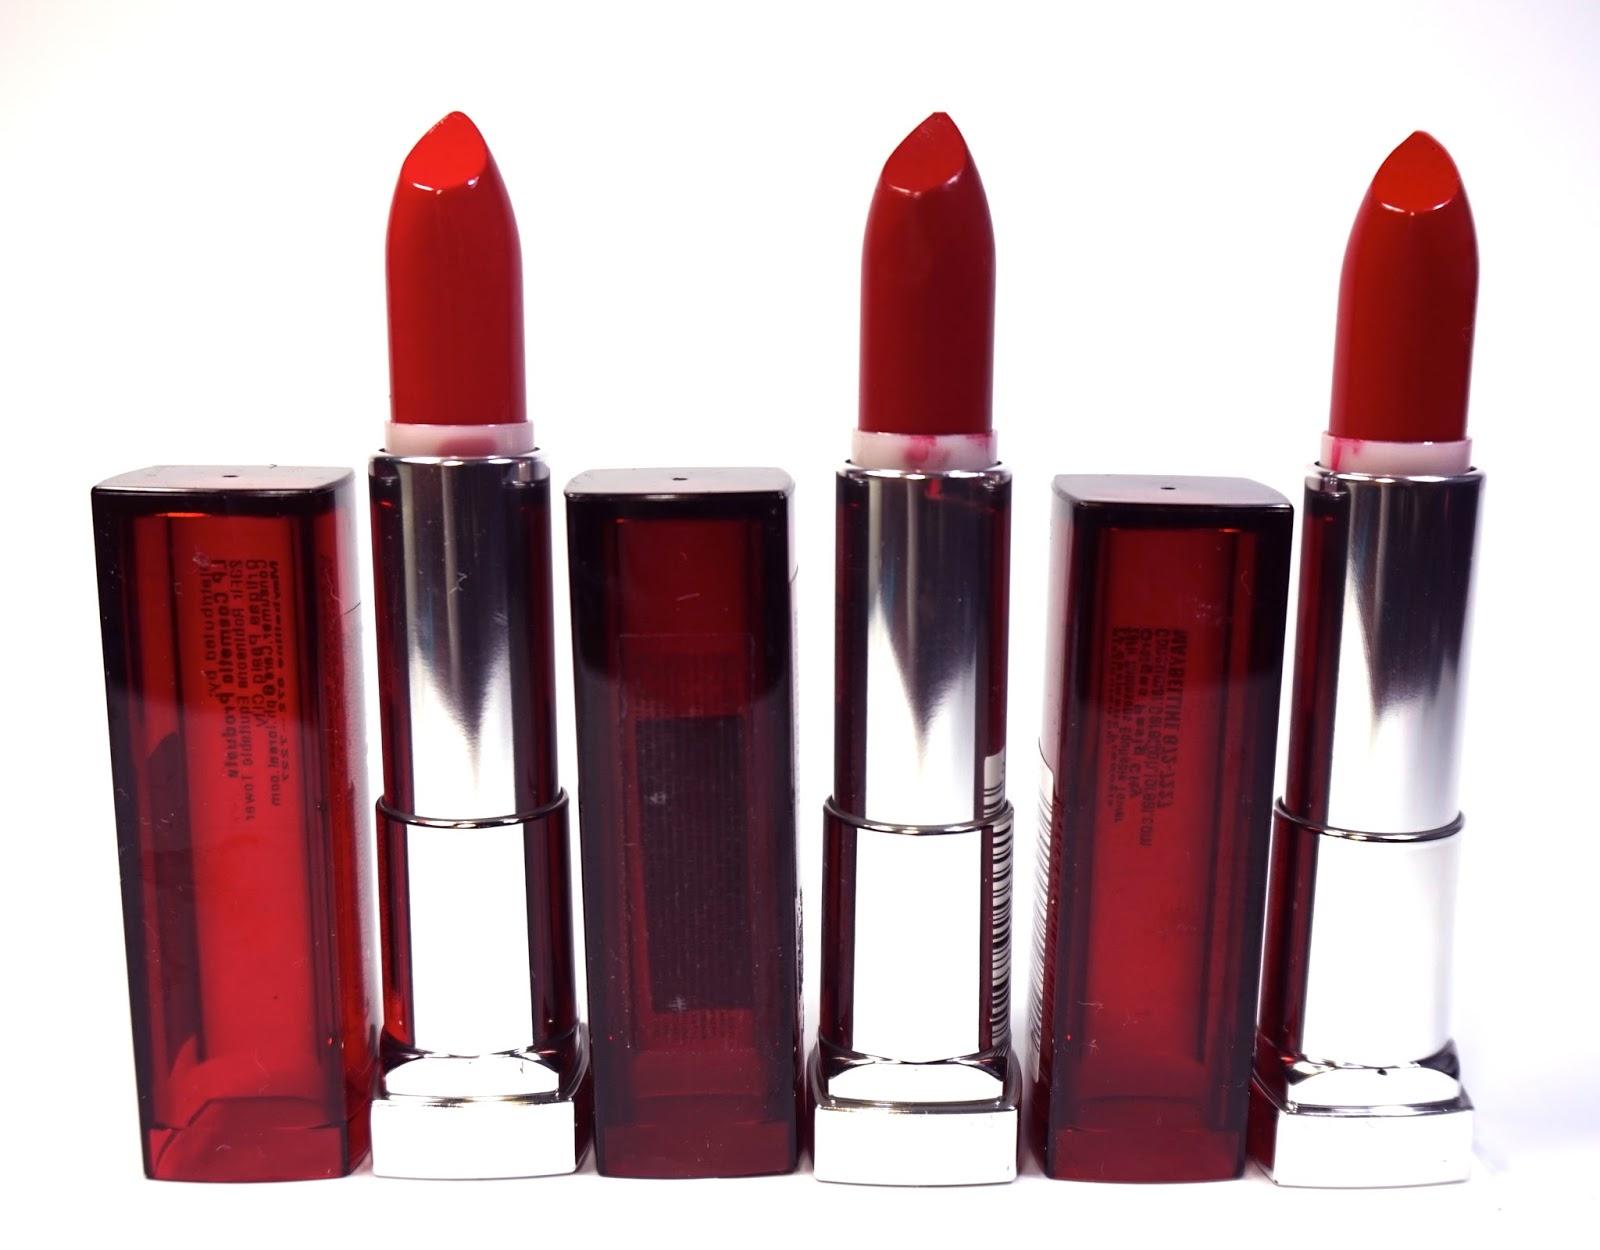 Maybelline Color Sensational Red Lipsticks Review ...